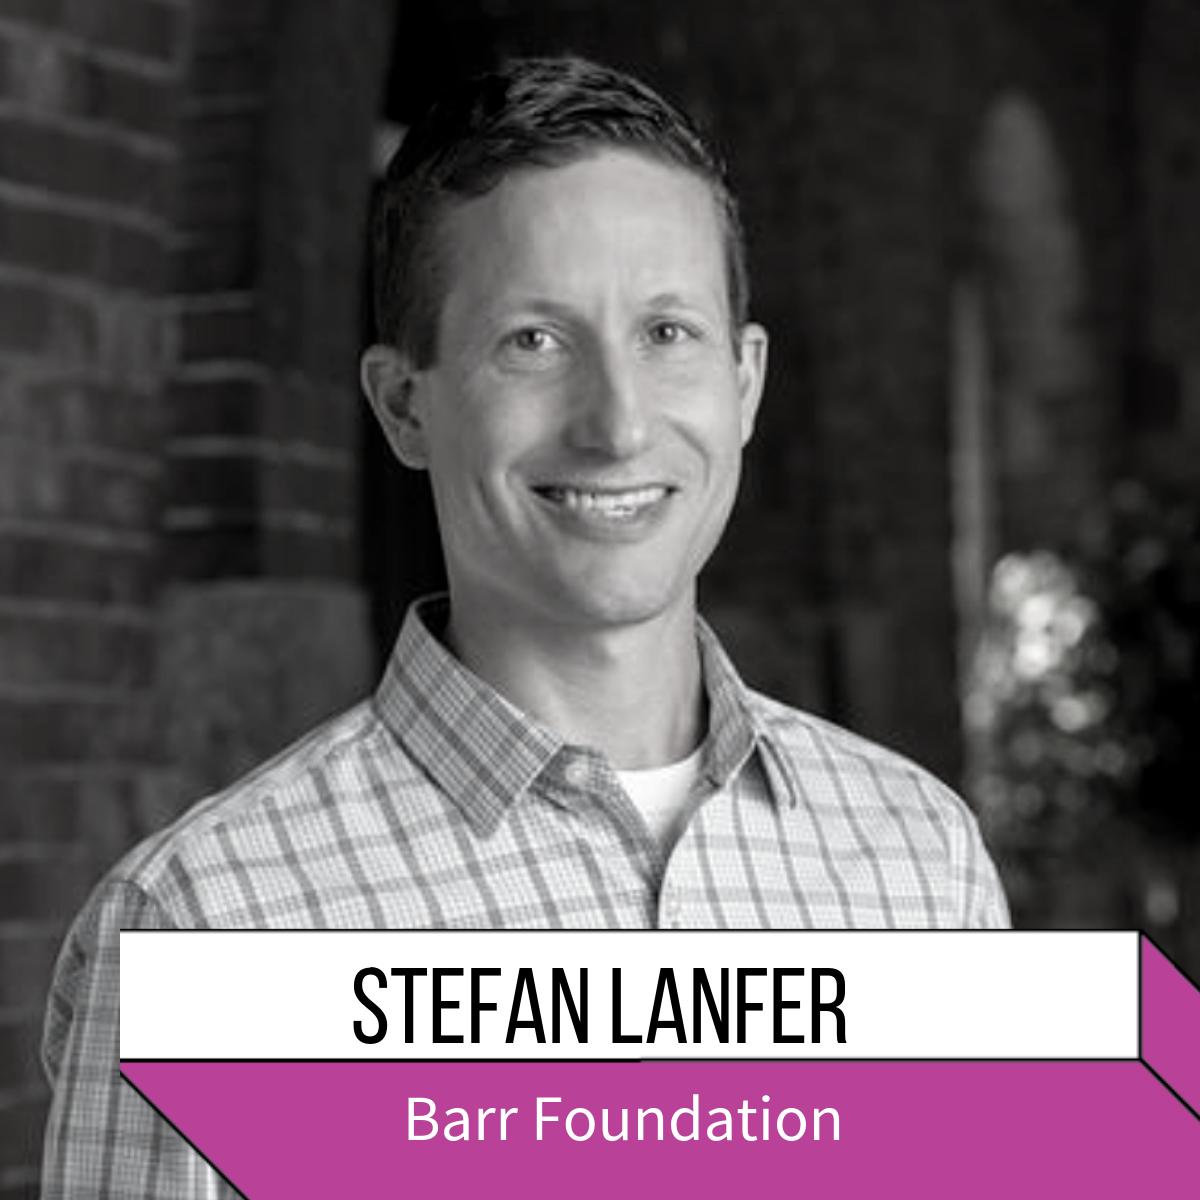 Stefan Lanfer Org.png